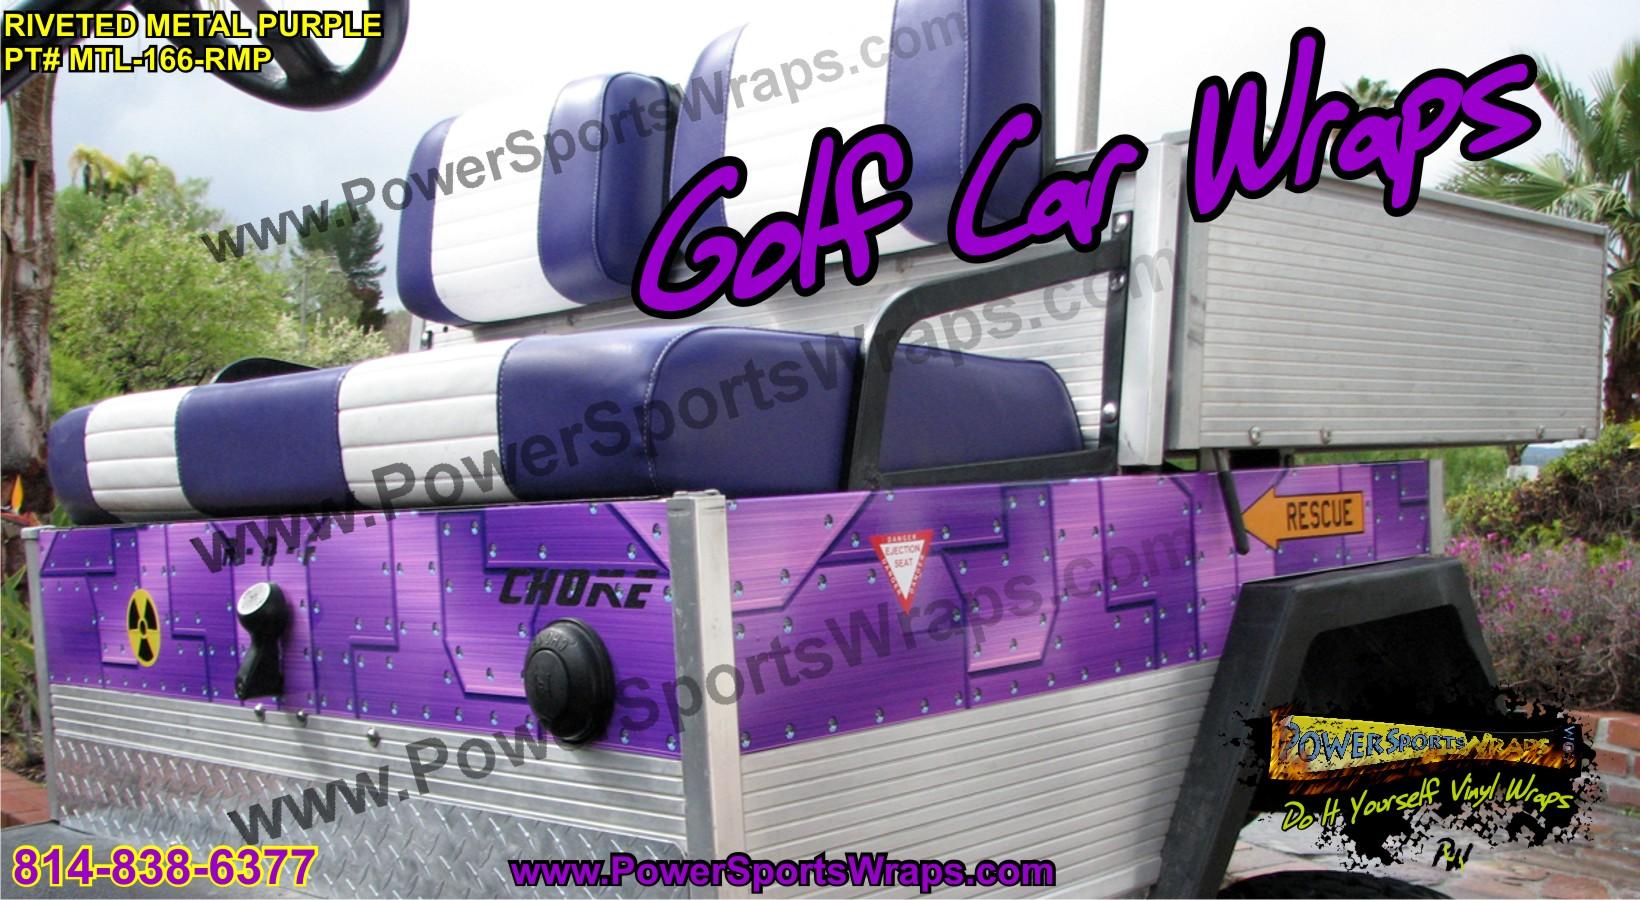 Golf Cart Vinyl Wrap Riveted Metal Purple | Powersportswraps.com Golfcartnames Com on